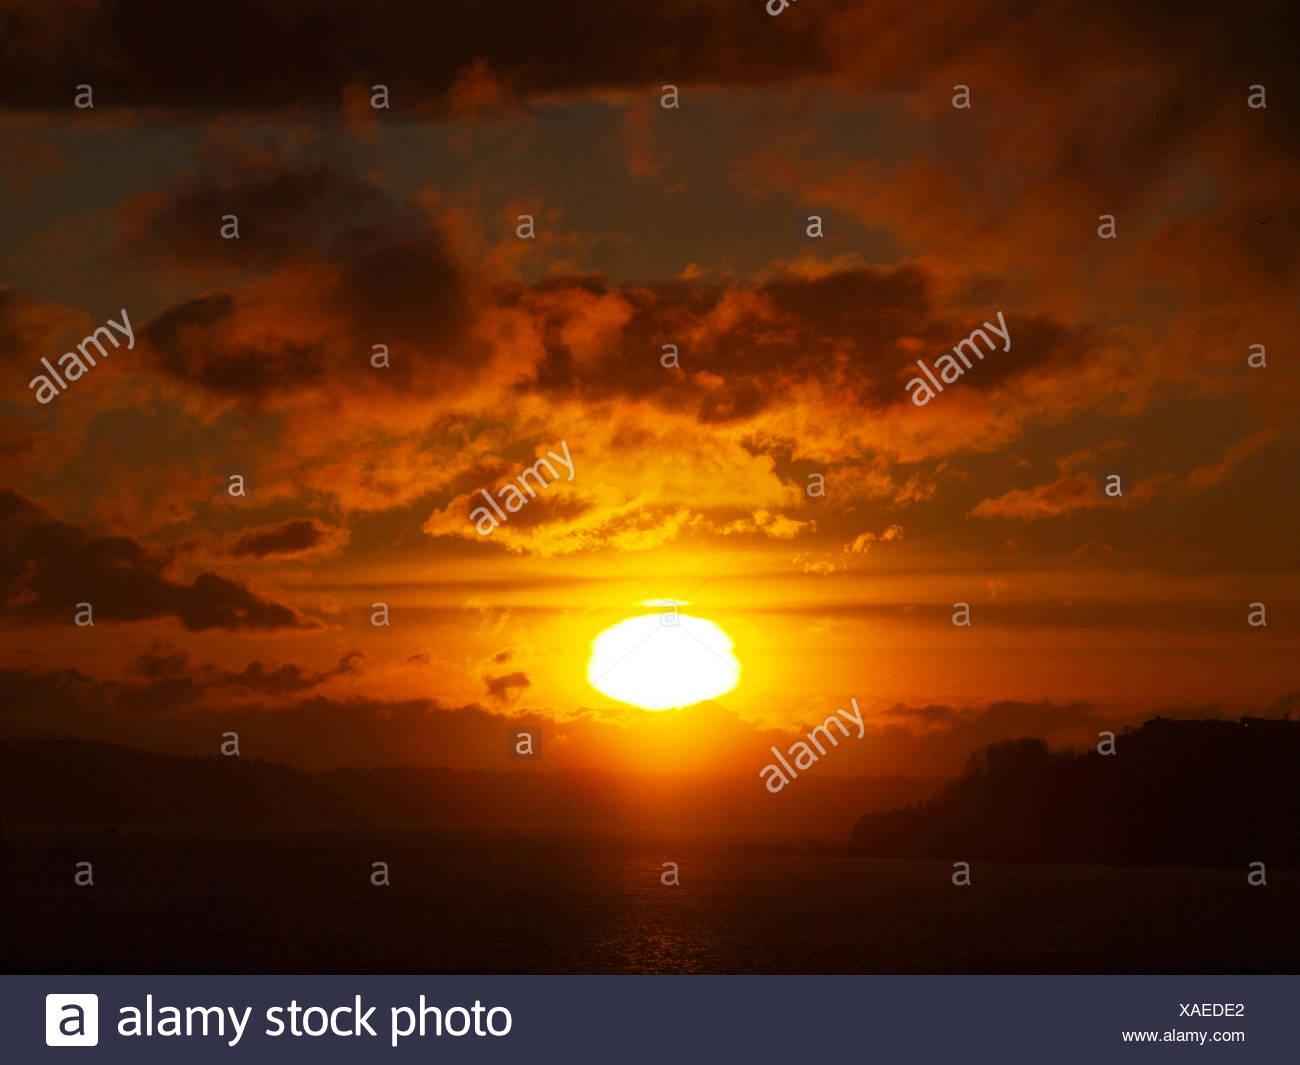 USA, Washington State, King County, Seattle, Sunset over land Stock Photo